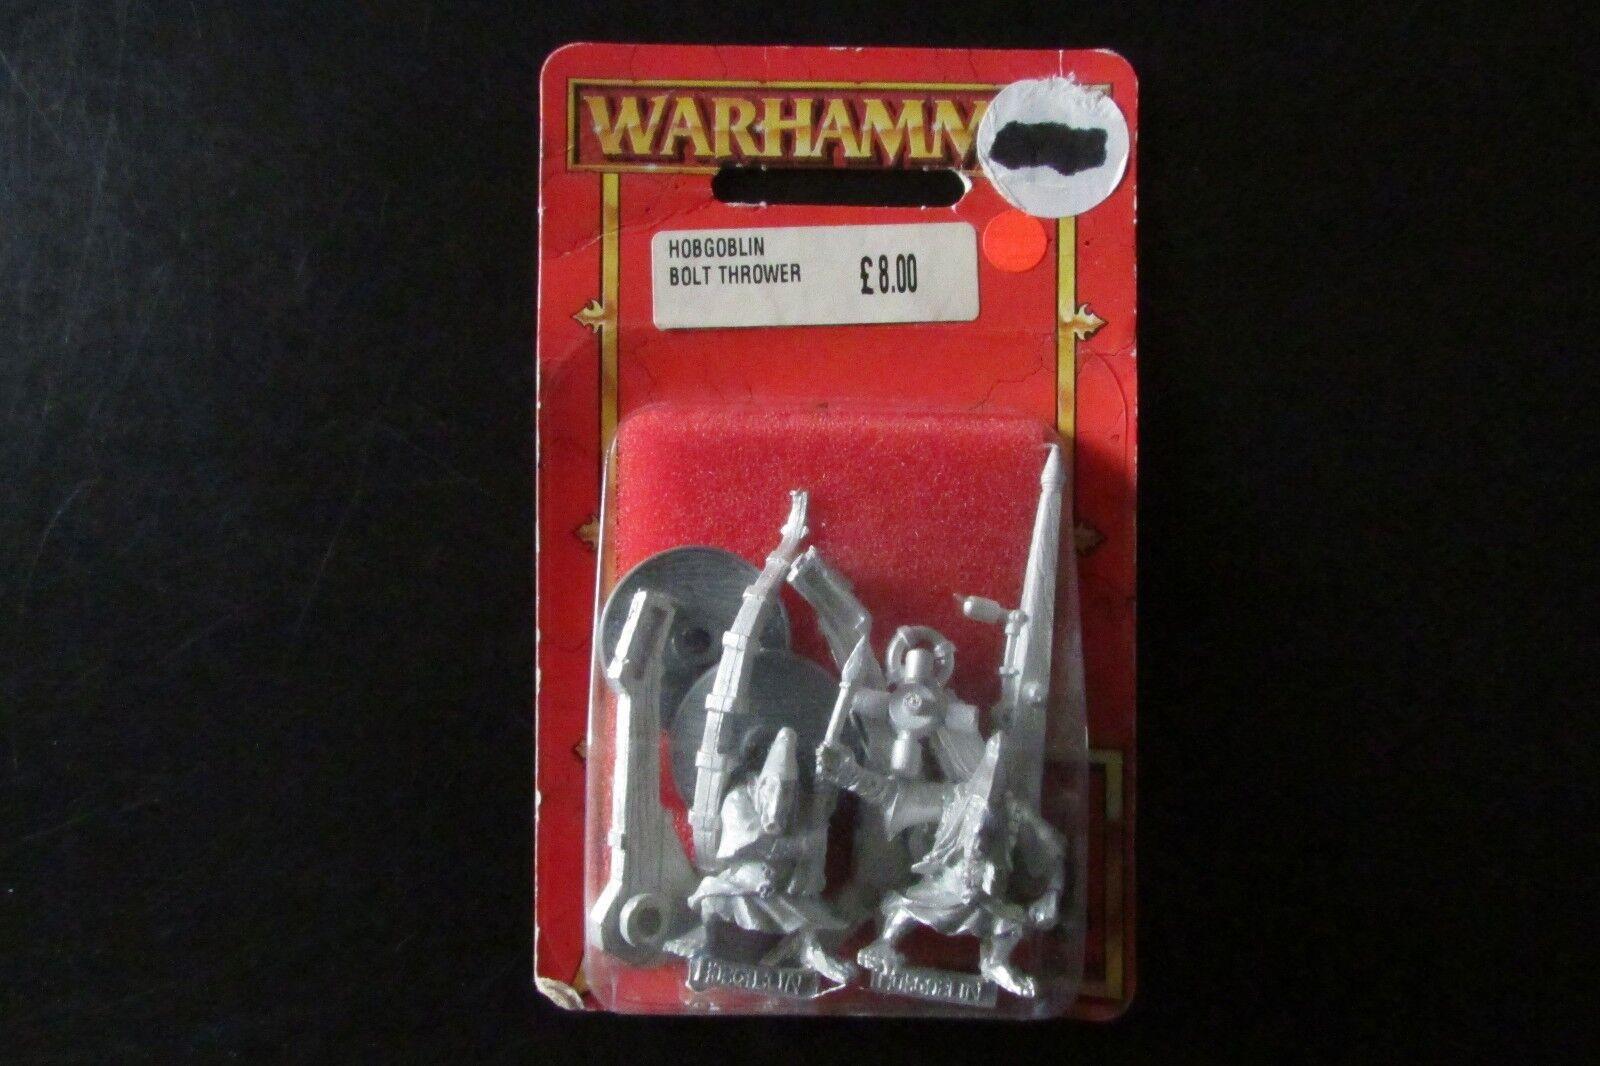 Épuisé Citadel WARHAMMER METAL NAIN Chaos Hobgoblin Bolt  lance EntièreHommest neuf dans sa boîte  grande remise